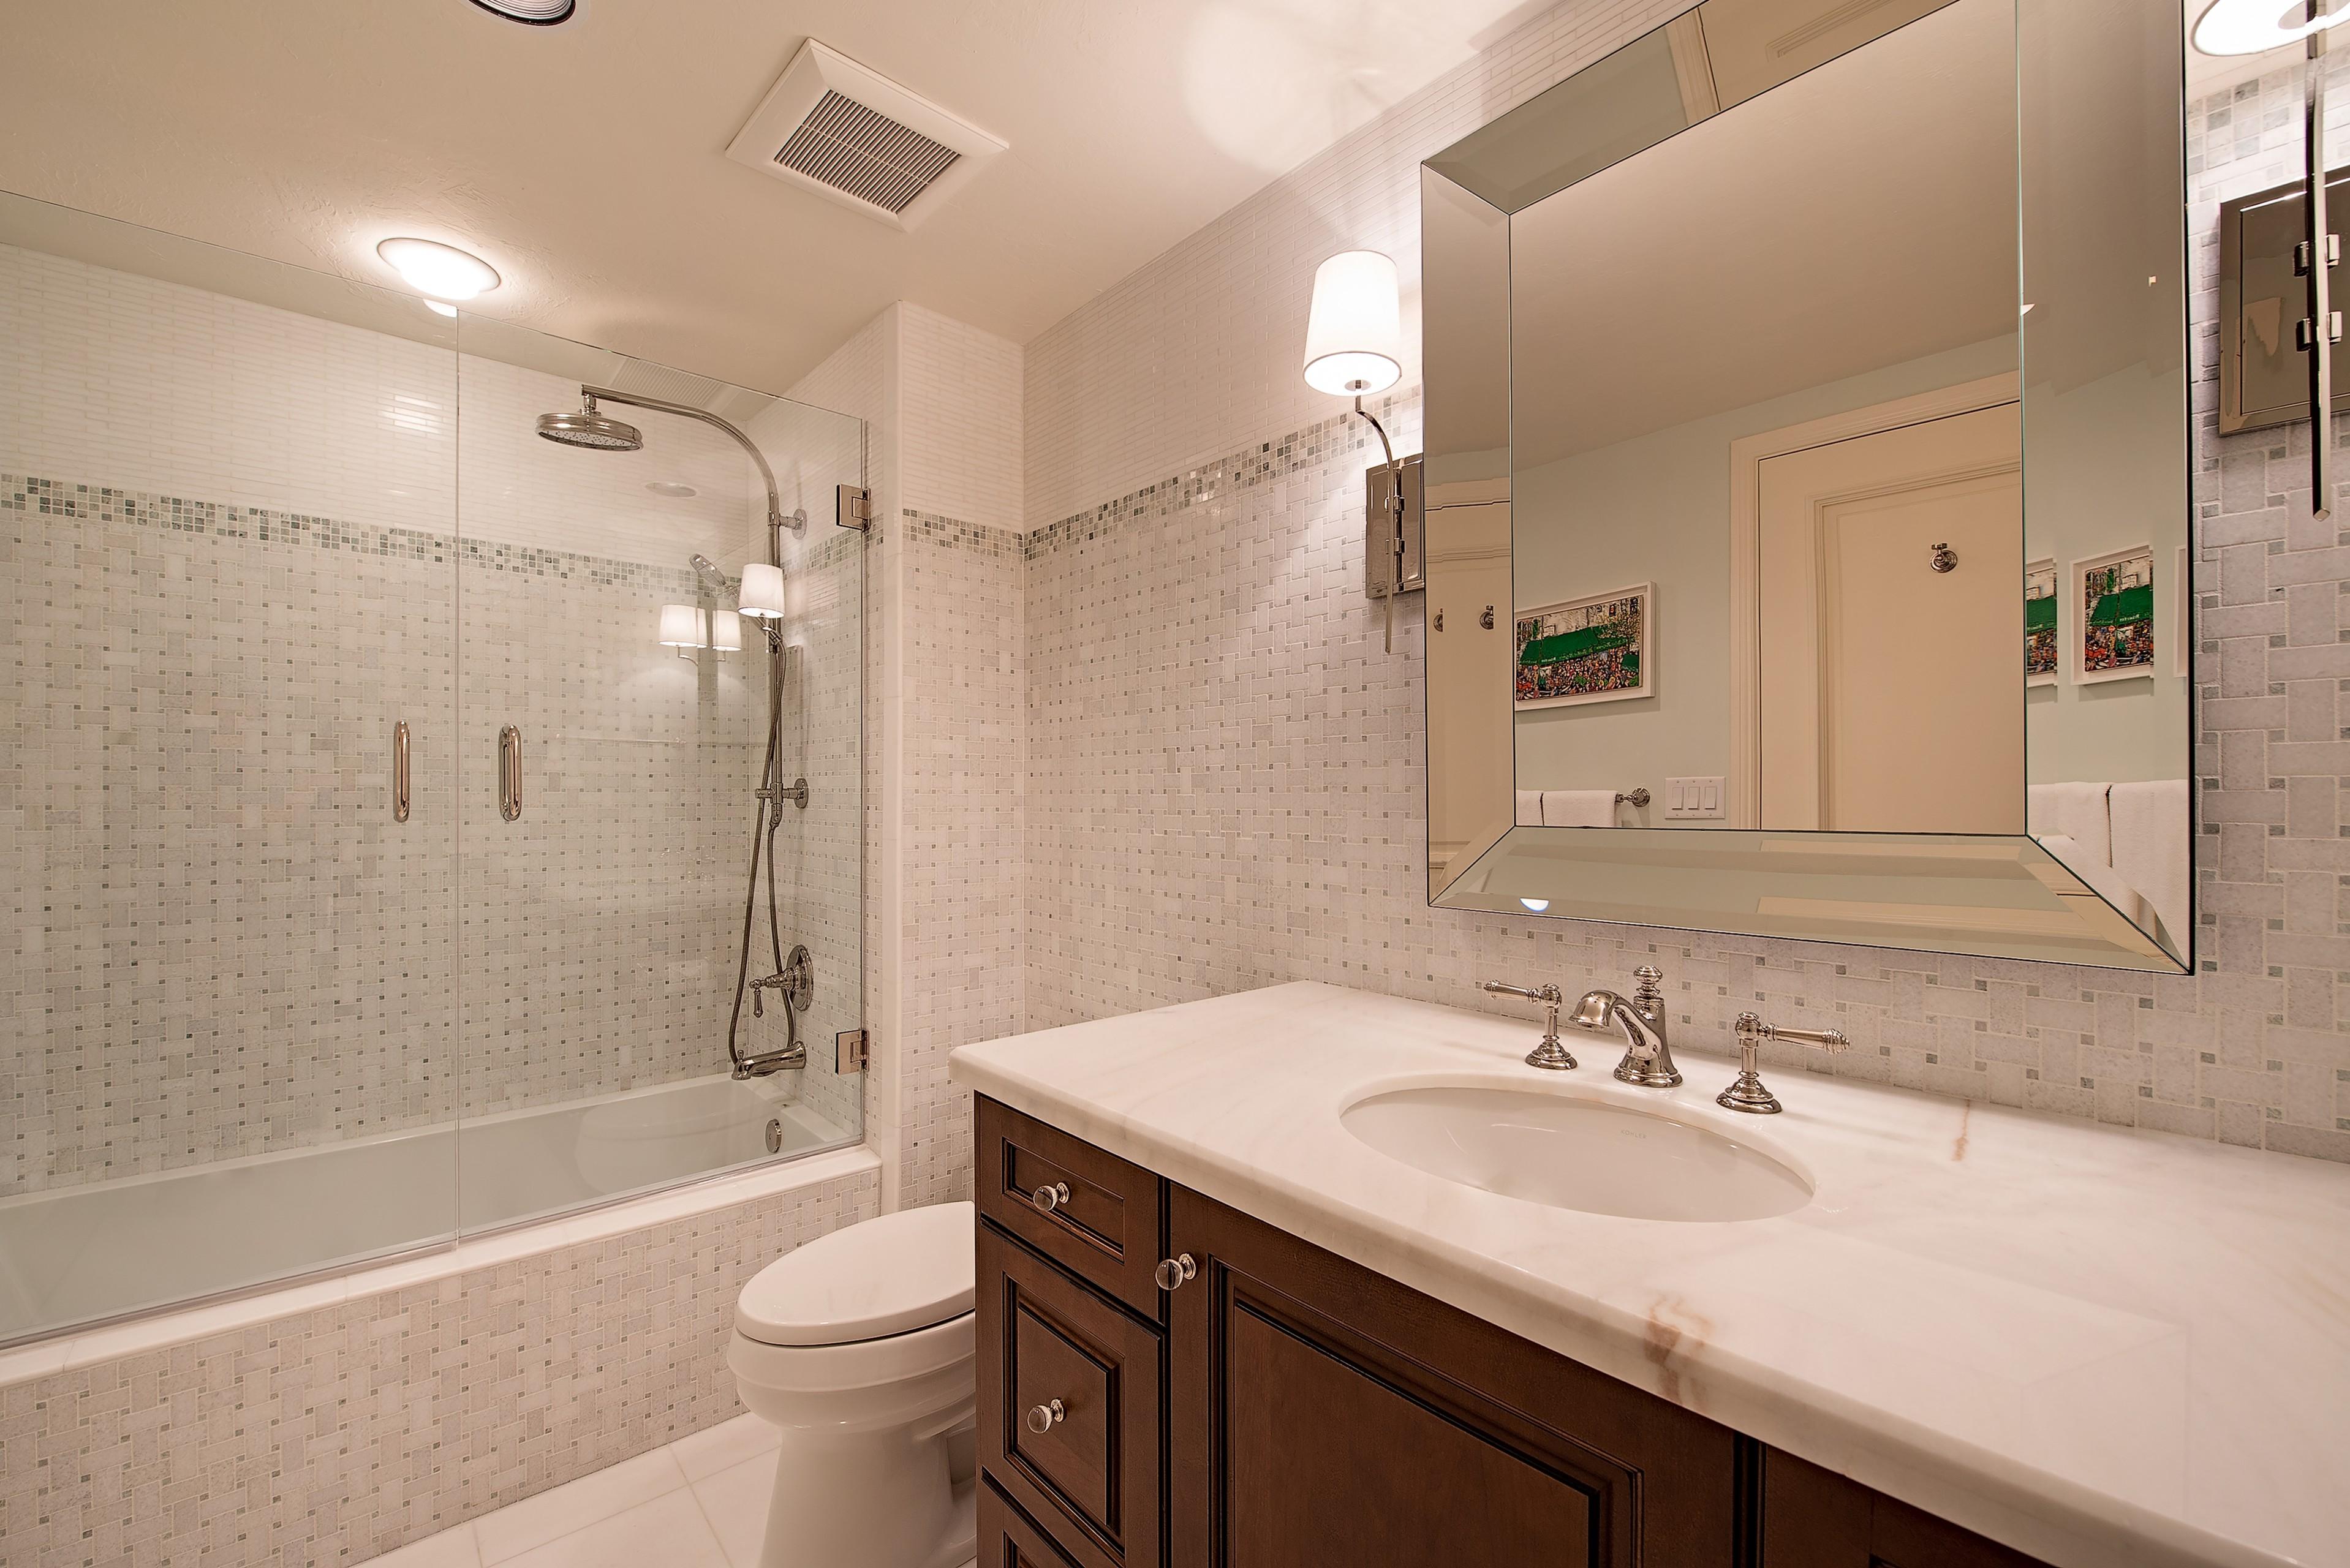 Certified Luxury Builders-41 West-Naples-Pelican Bay-St. Raphael-HR-Remodel 2 A